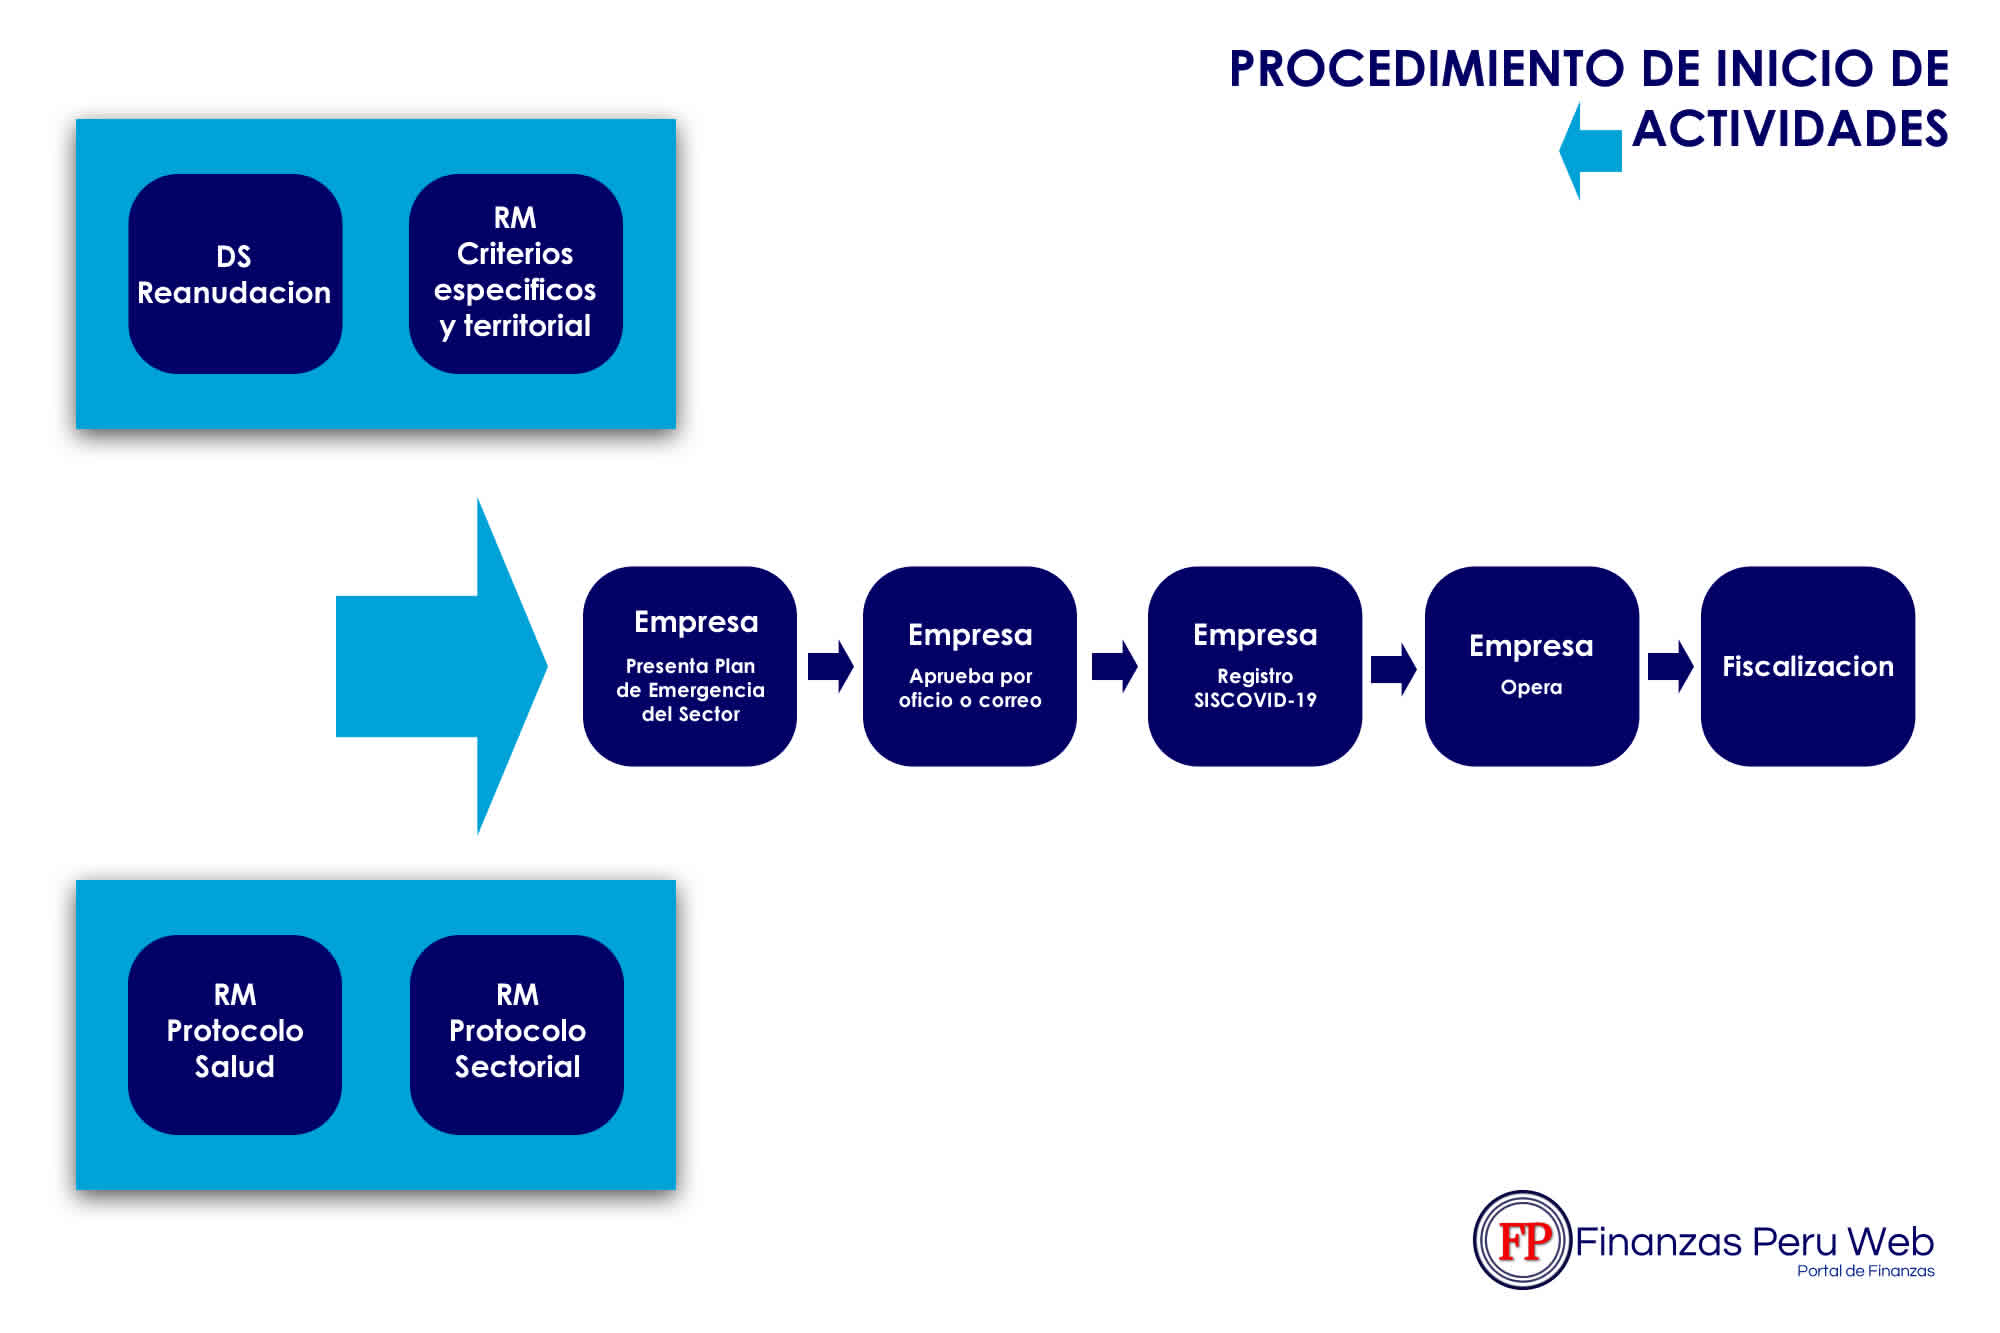 FINANZAS PERU WEB | PROTOCOLO